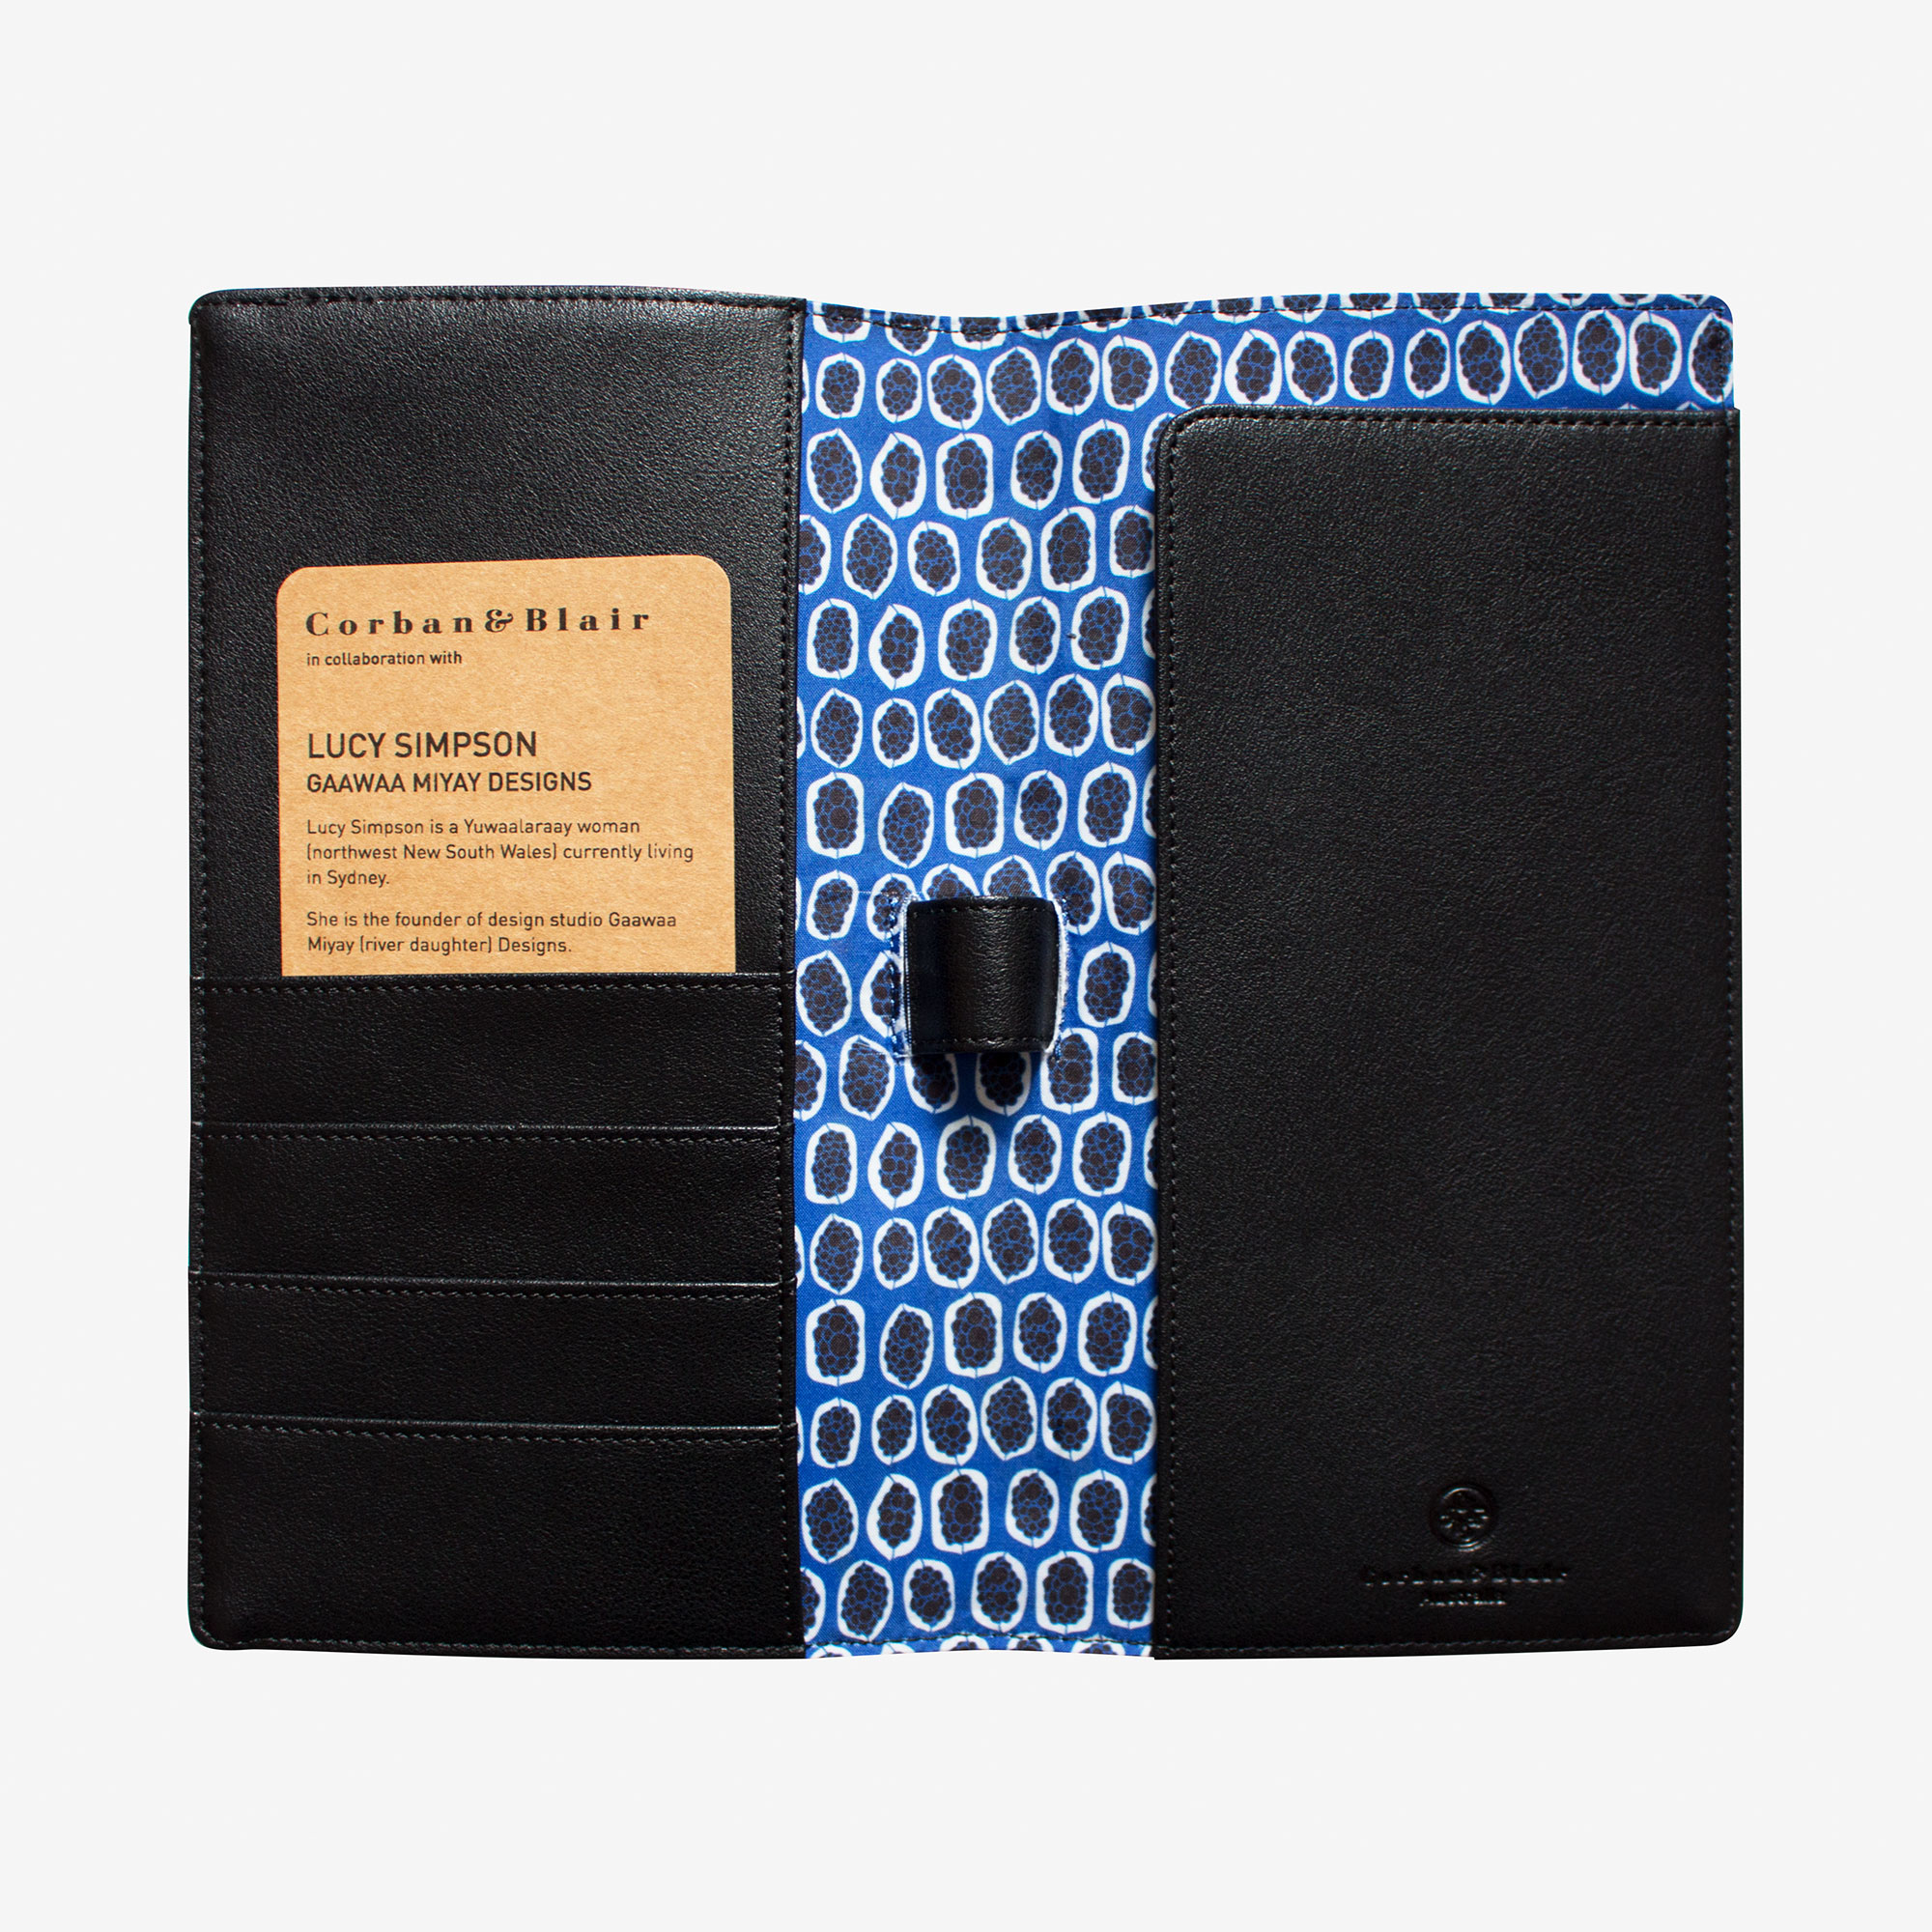 20047-Travel-wallet-gwiibiirr-black-1